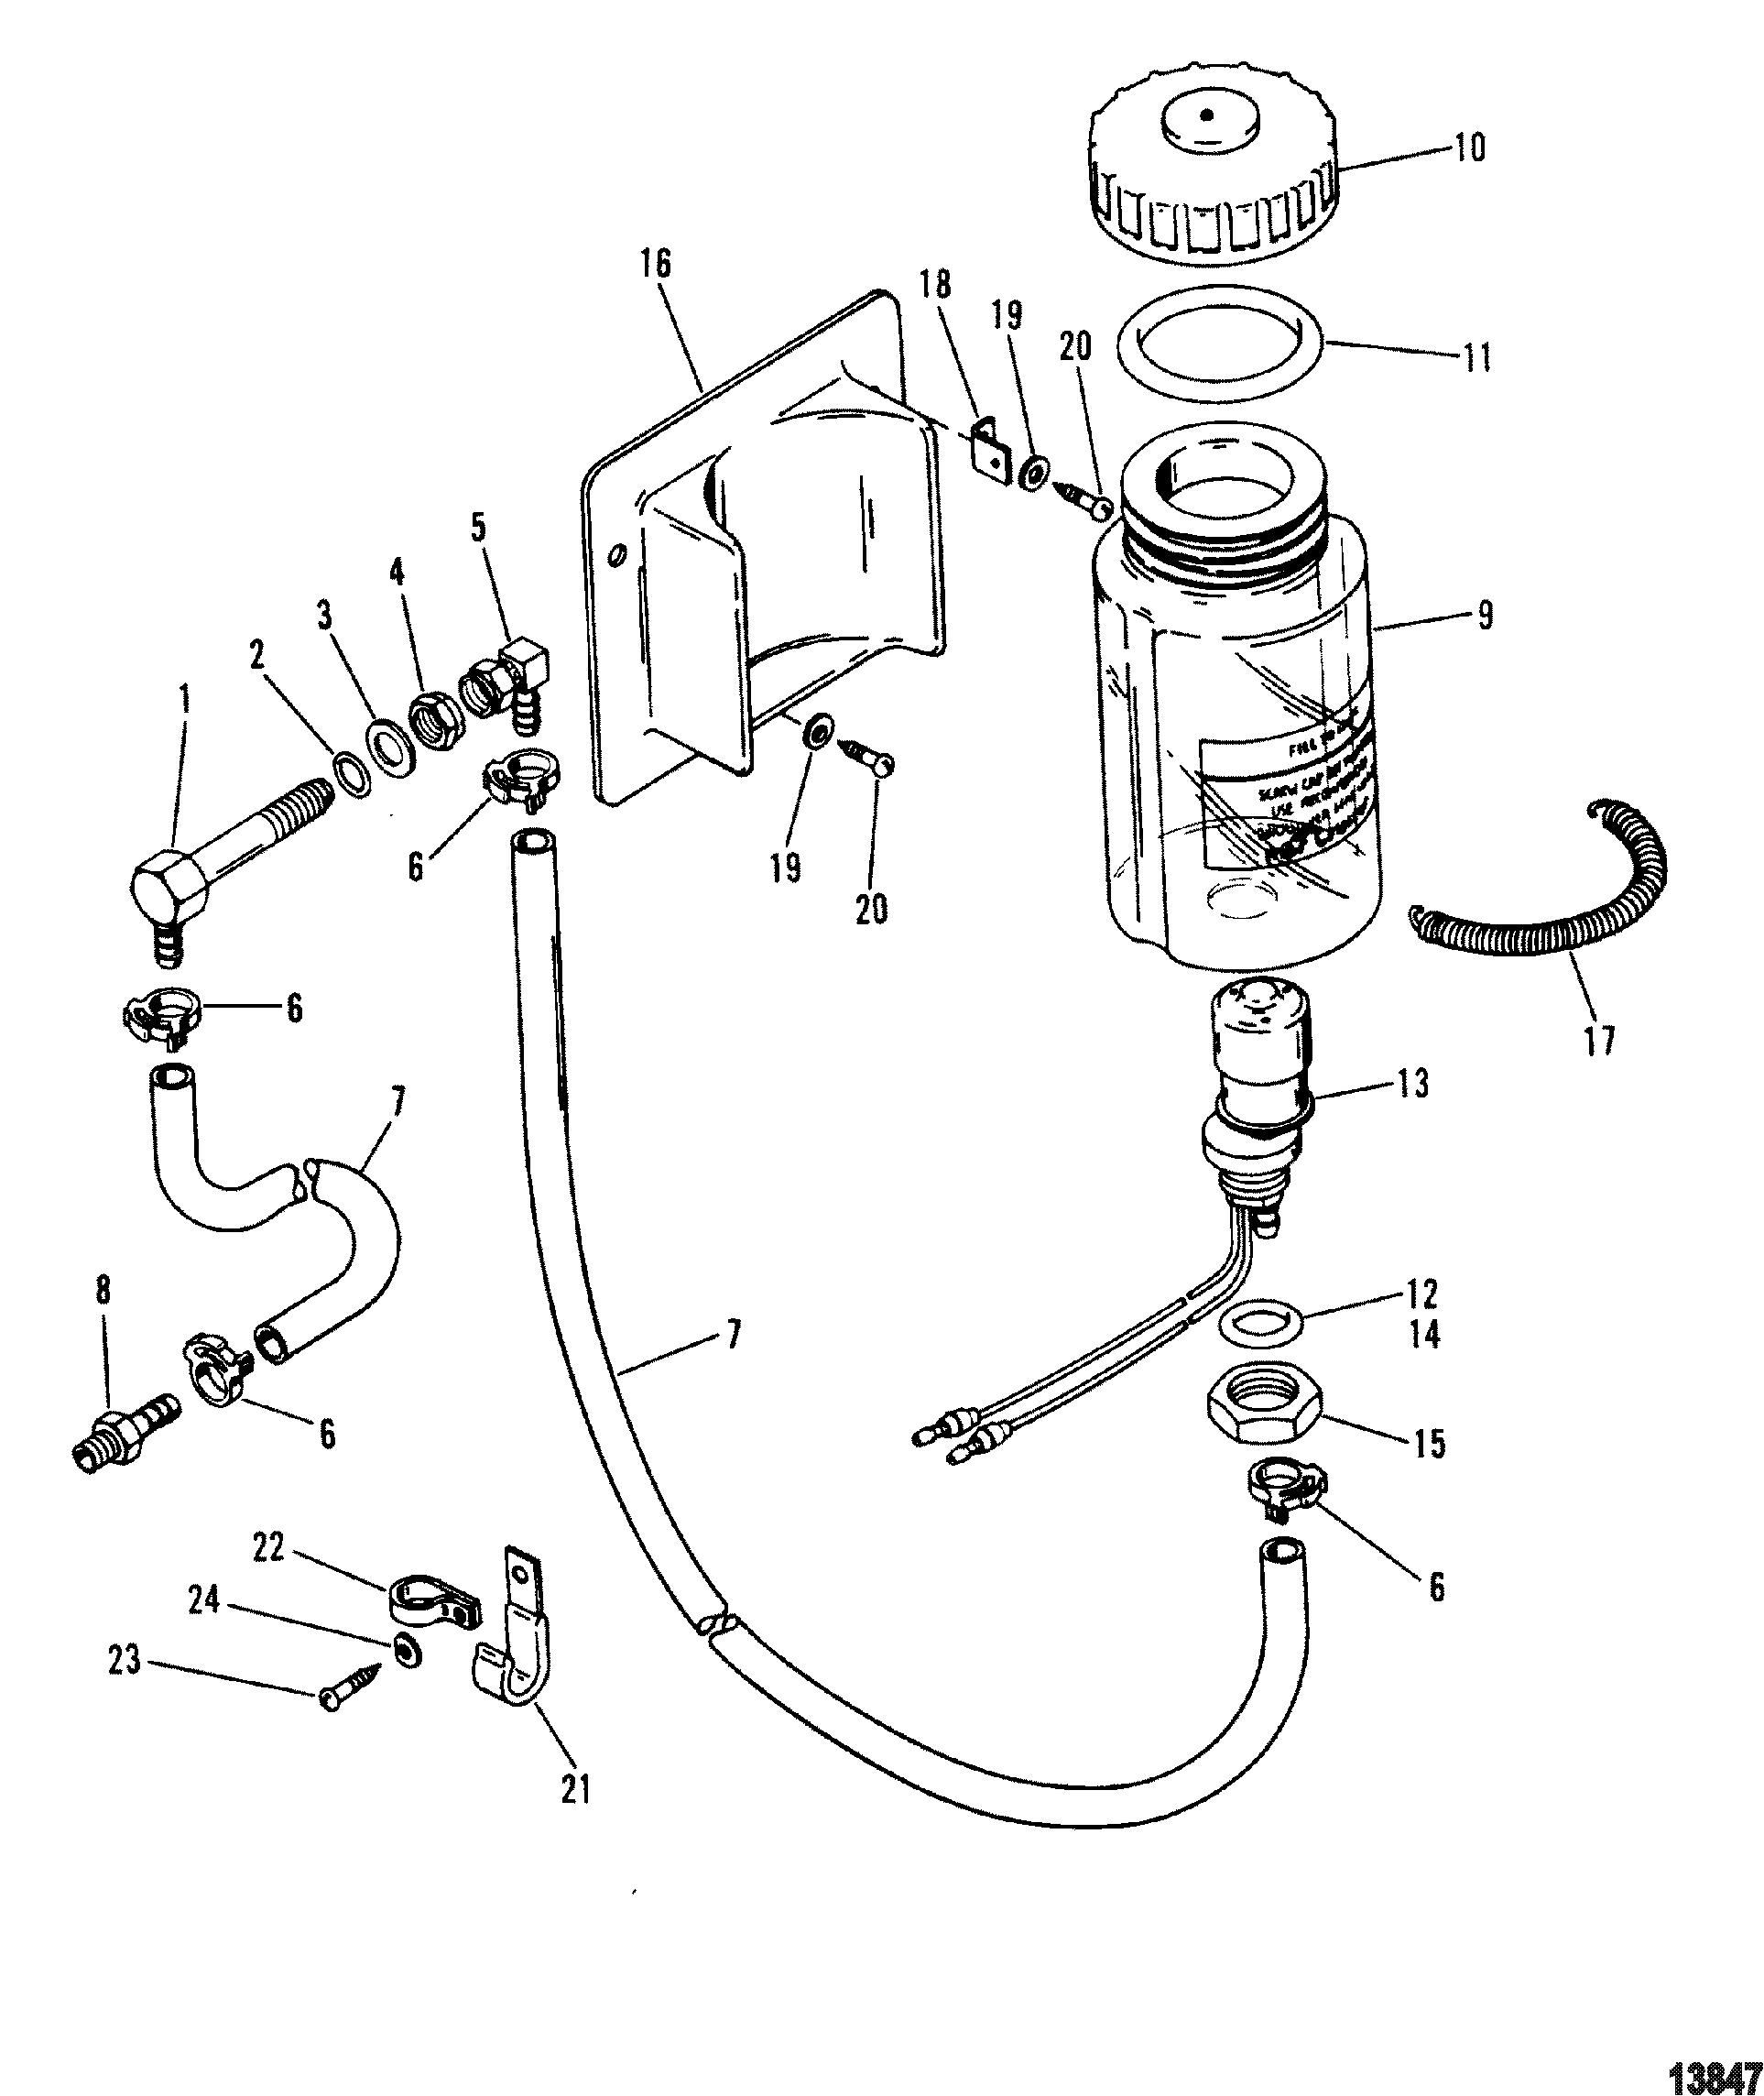 alpha one sterndrive parts diagram show er for library management system oil reservoir components round bottle mercruiser